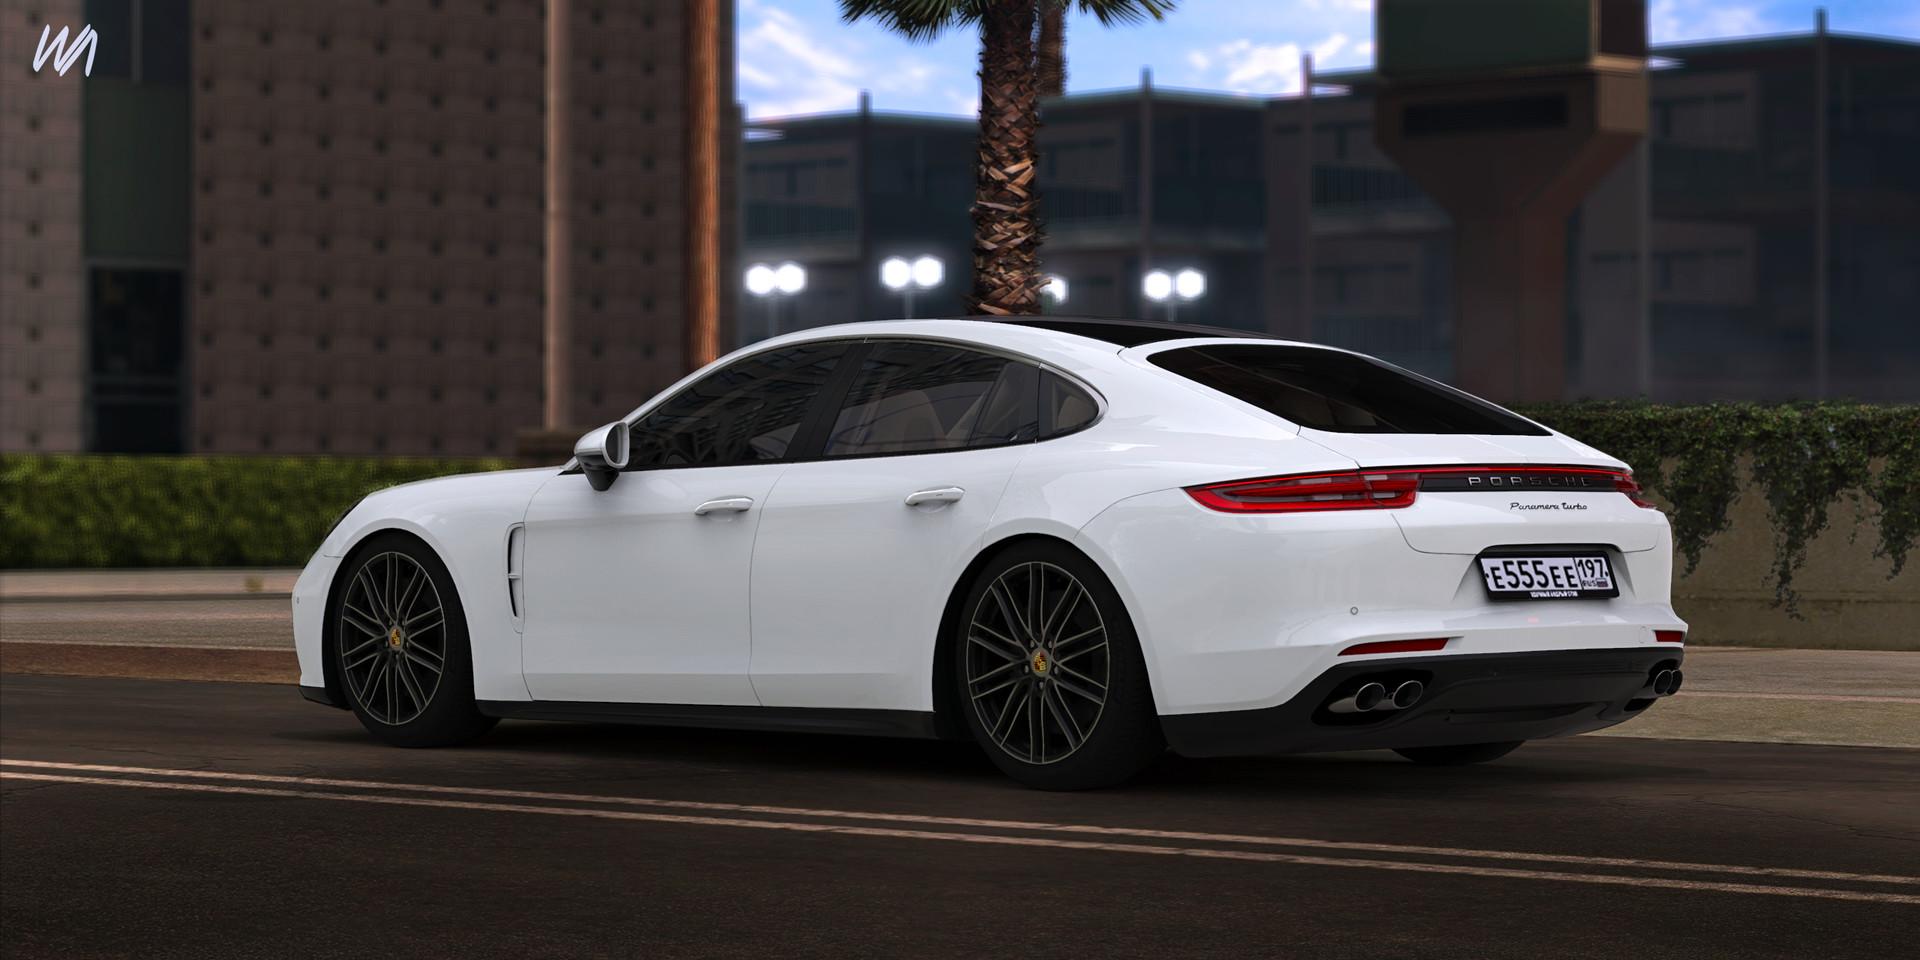 ArtStation - Porsche Panamera Turbo, Vladimir Kravchenko